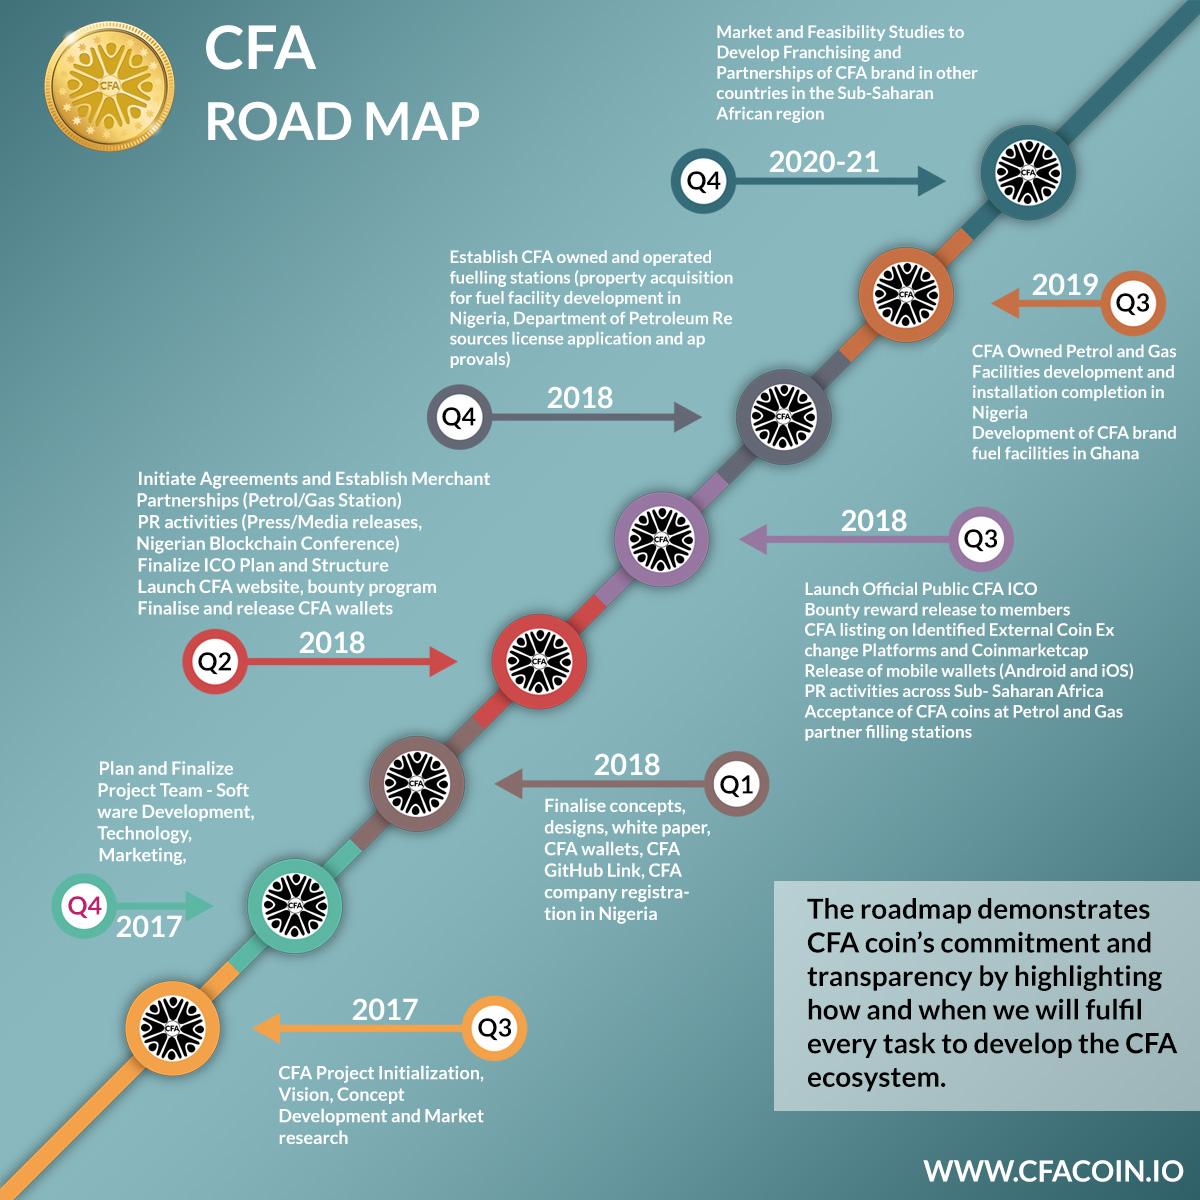 CFAcoin's Roadmap